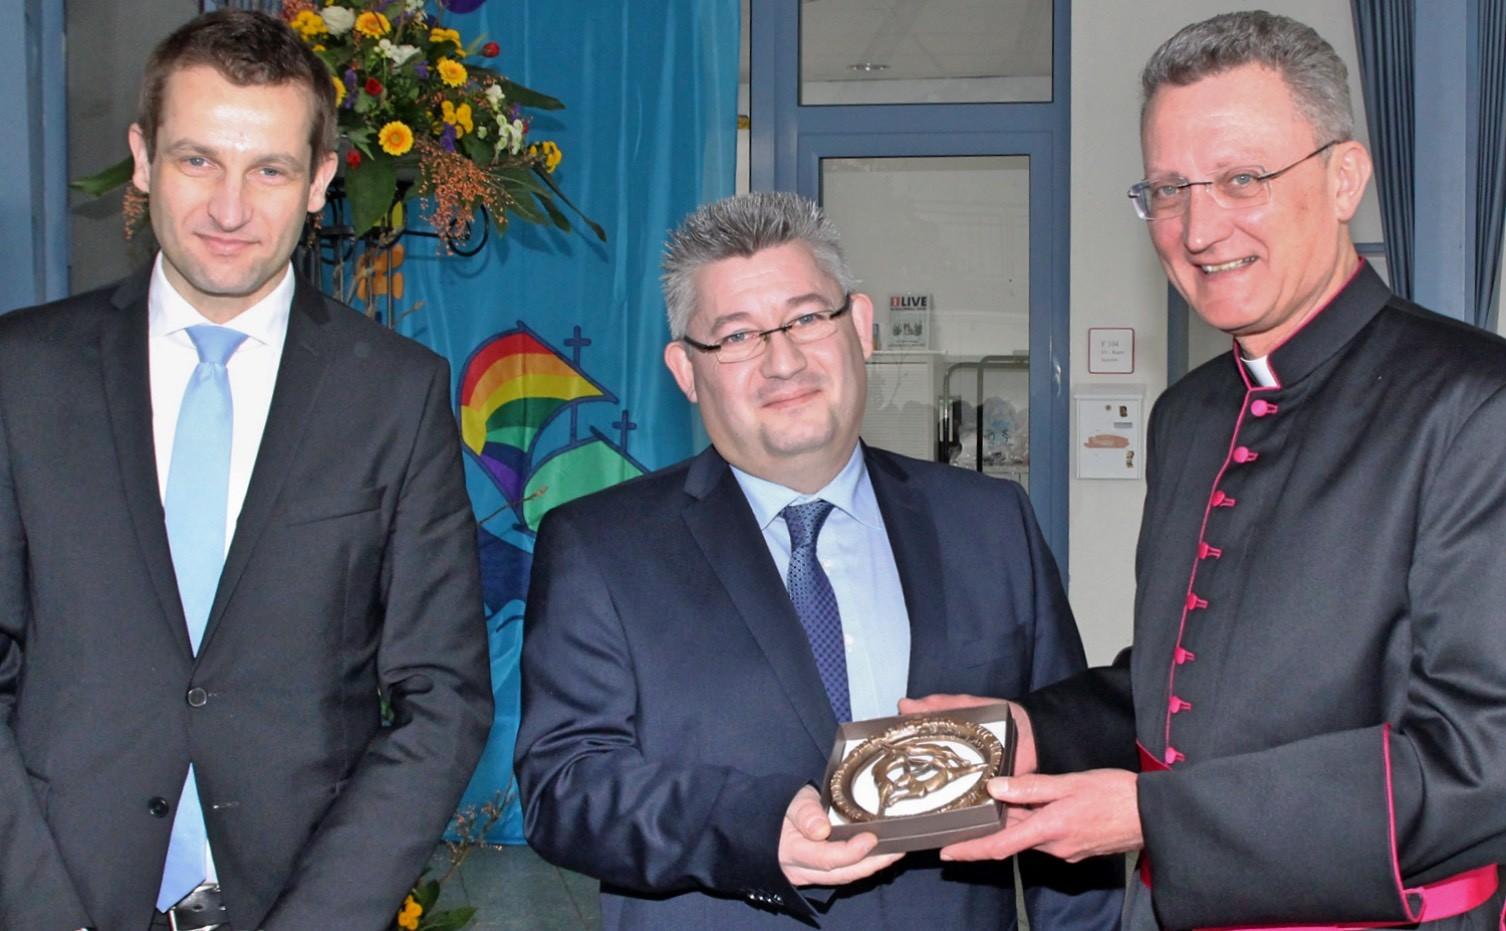 St ursula realschule offizielle amts bergabe an rektor for Koch paderborn